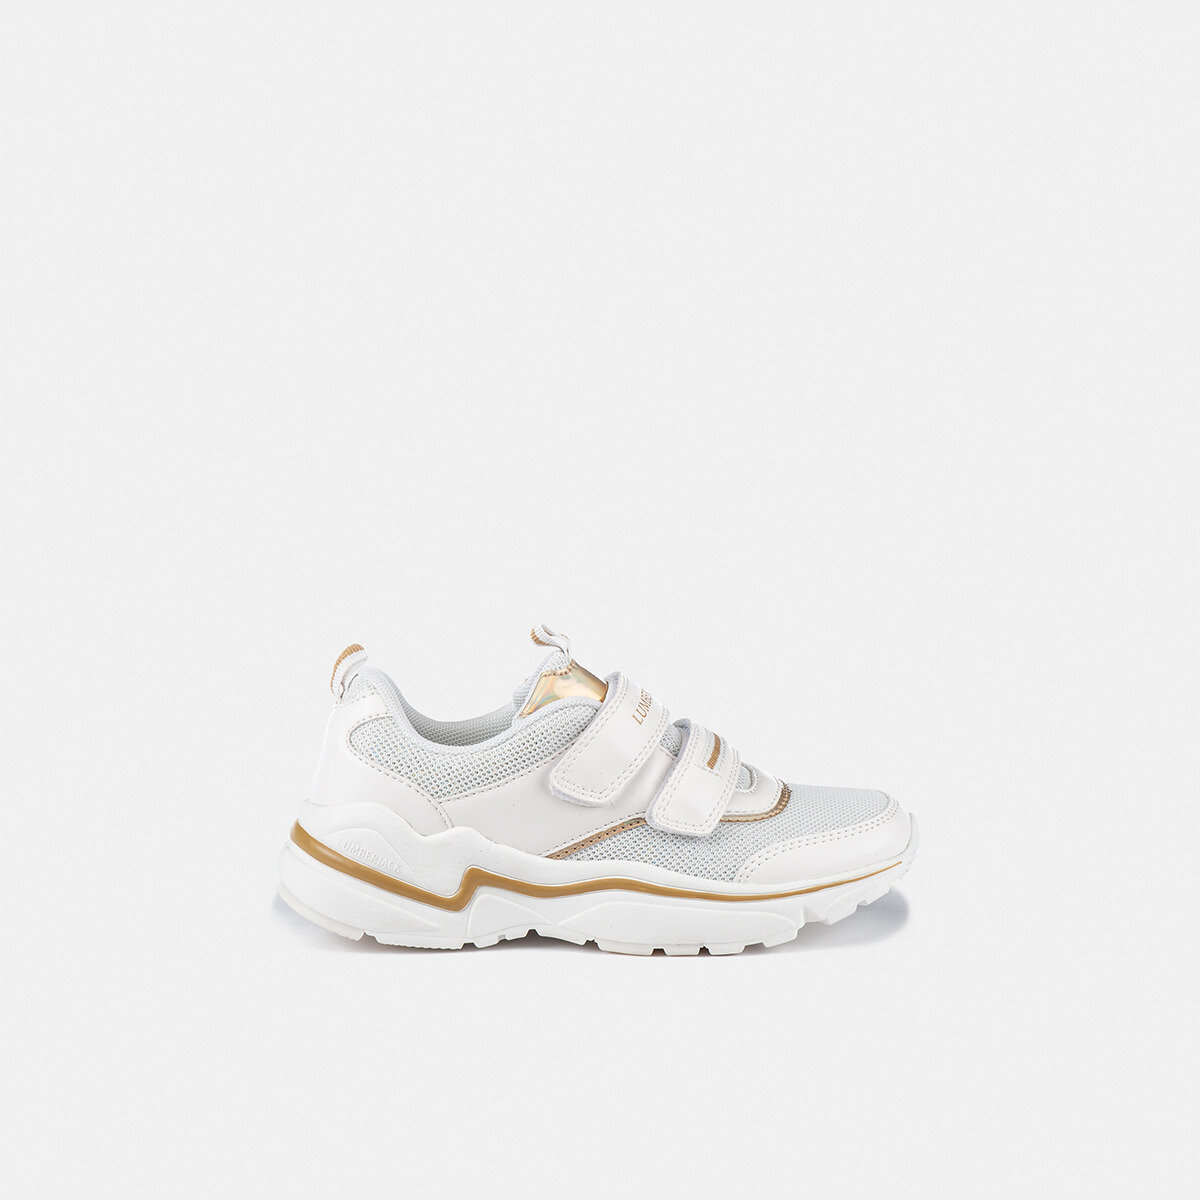 DREW WHITE/GOLD Girl Sneakers